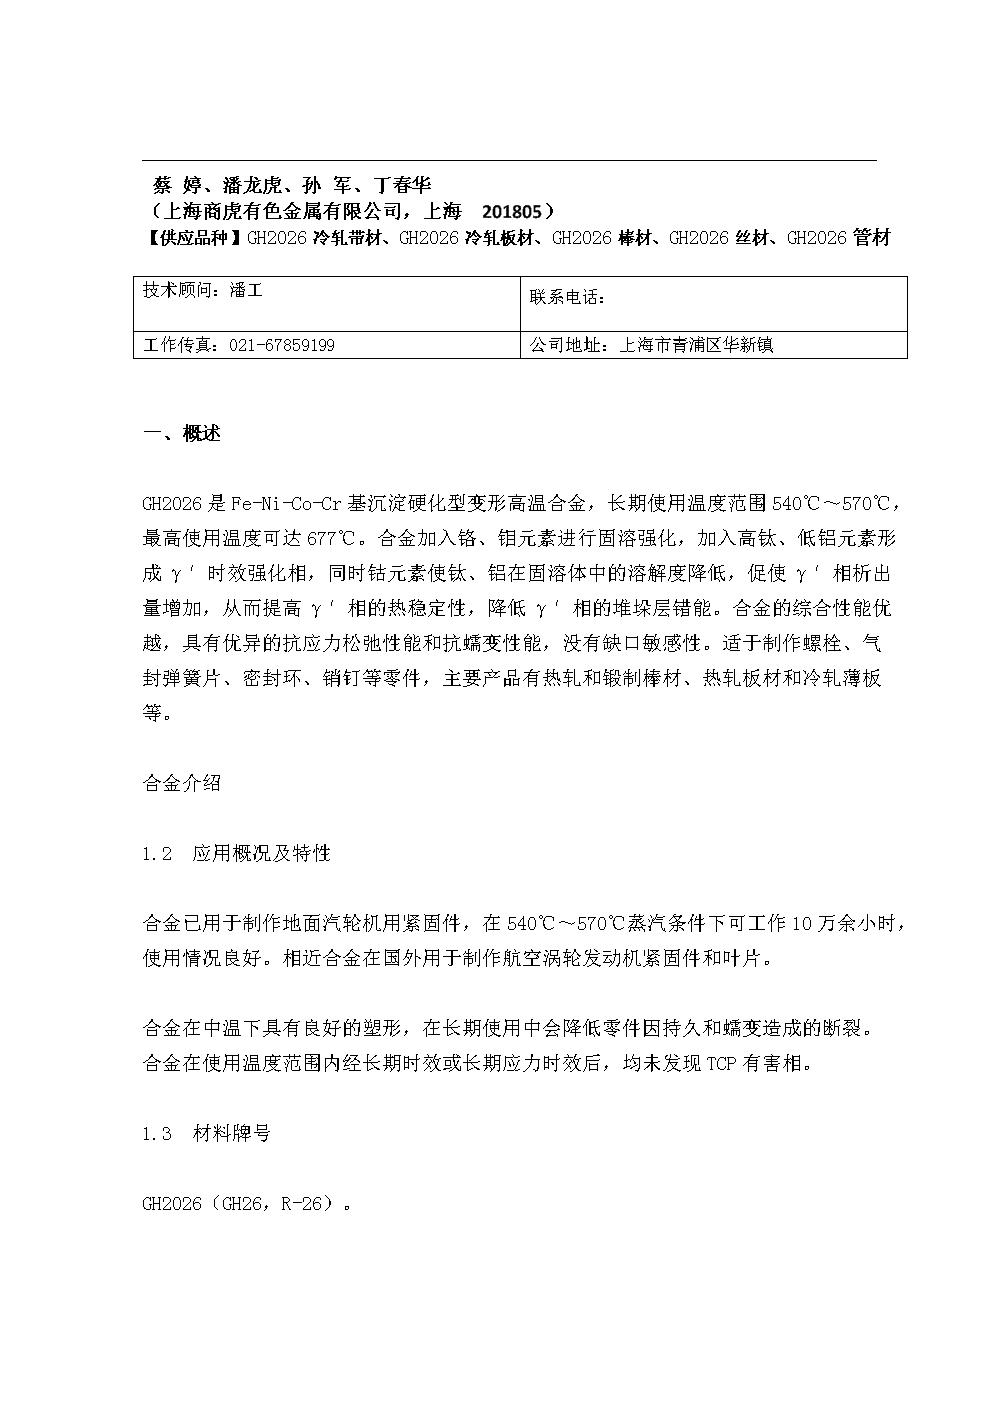 GH2026镍基合金-上海商虎合金技术.doc